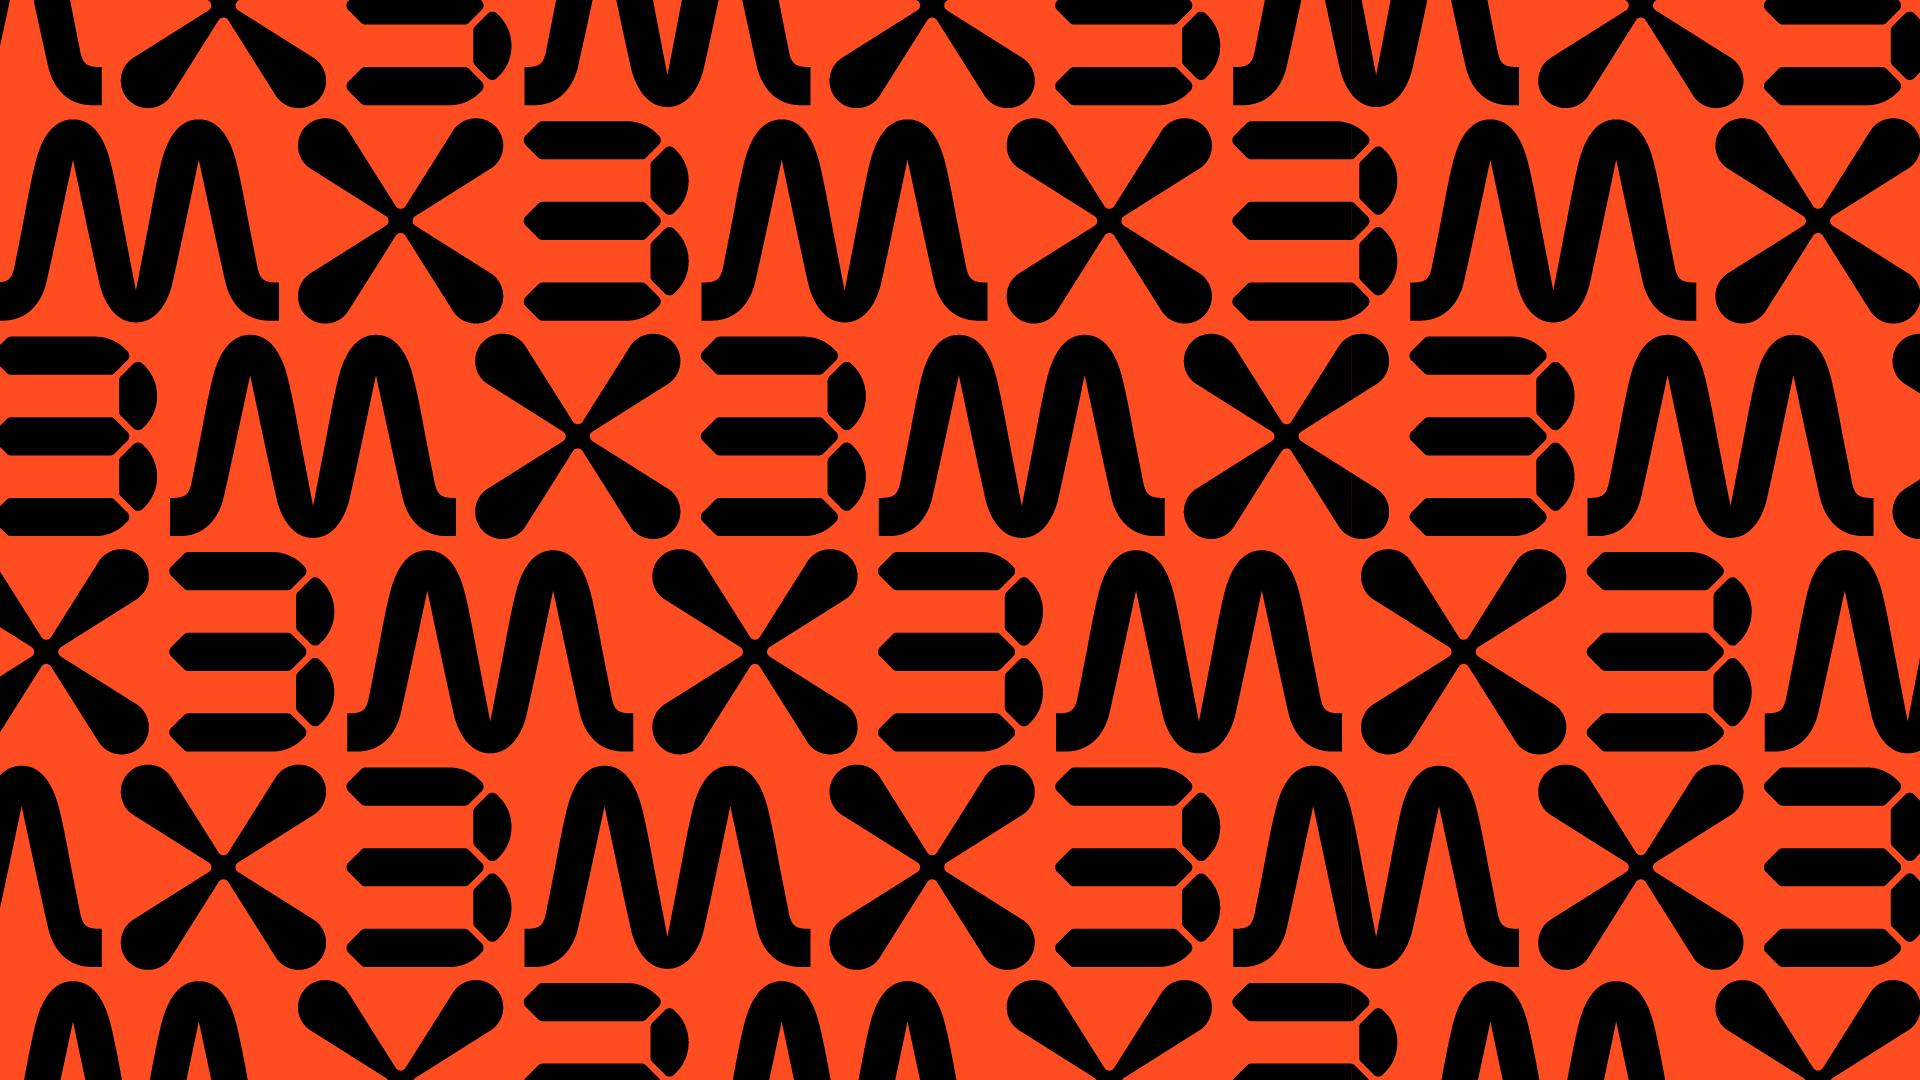 Ylex3m